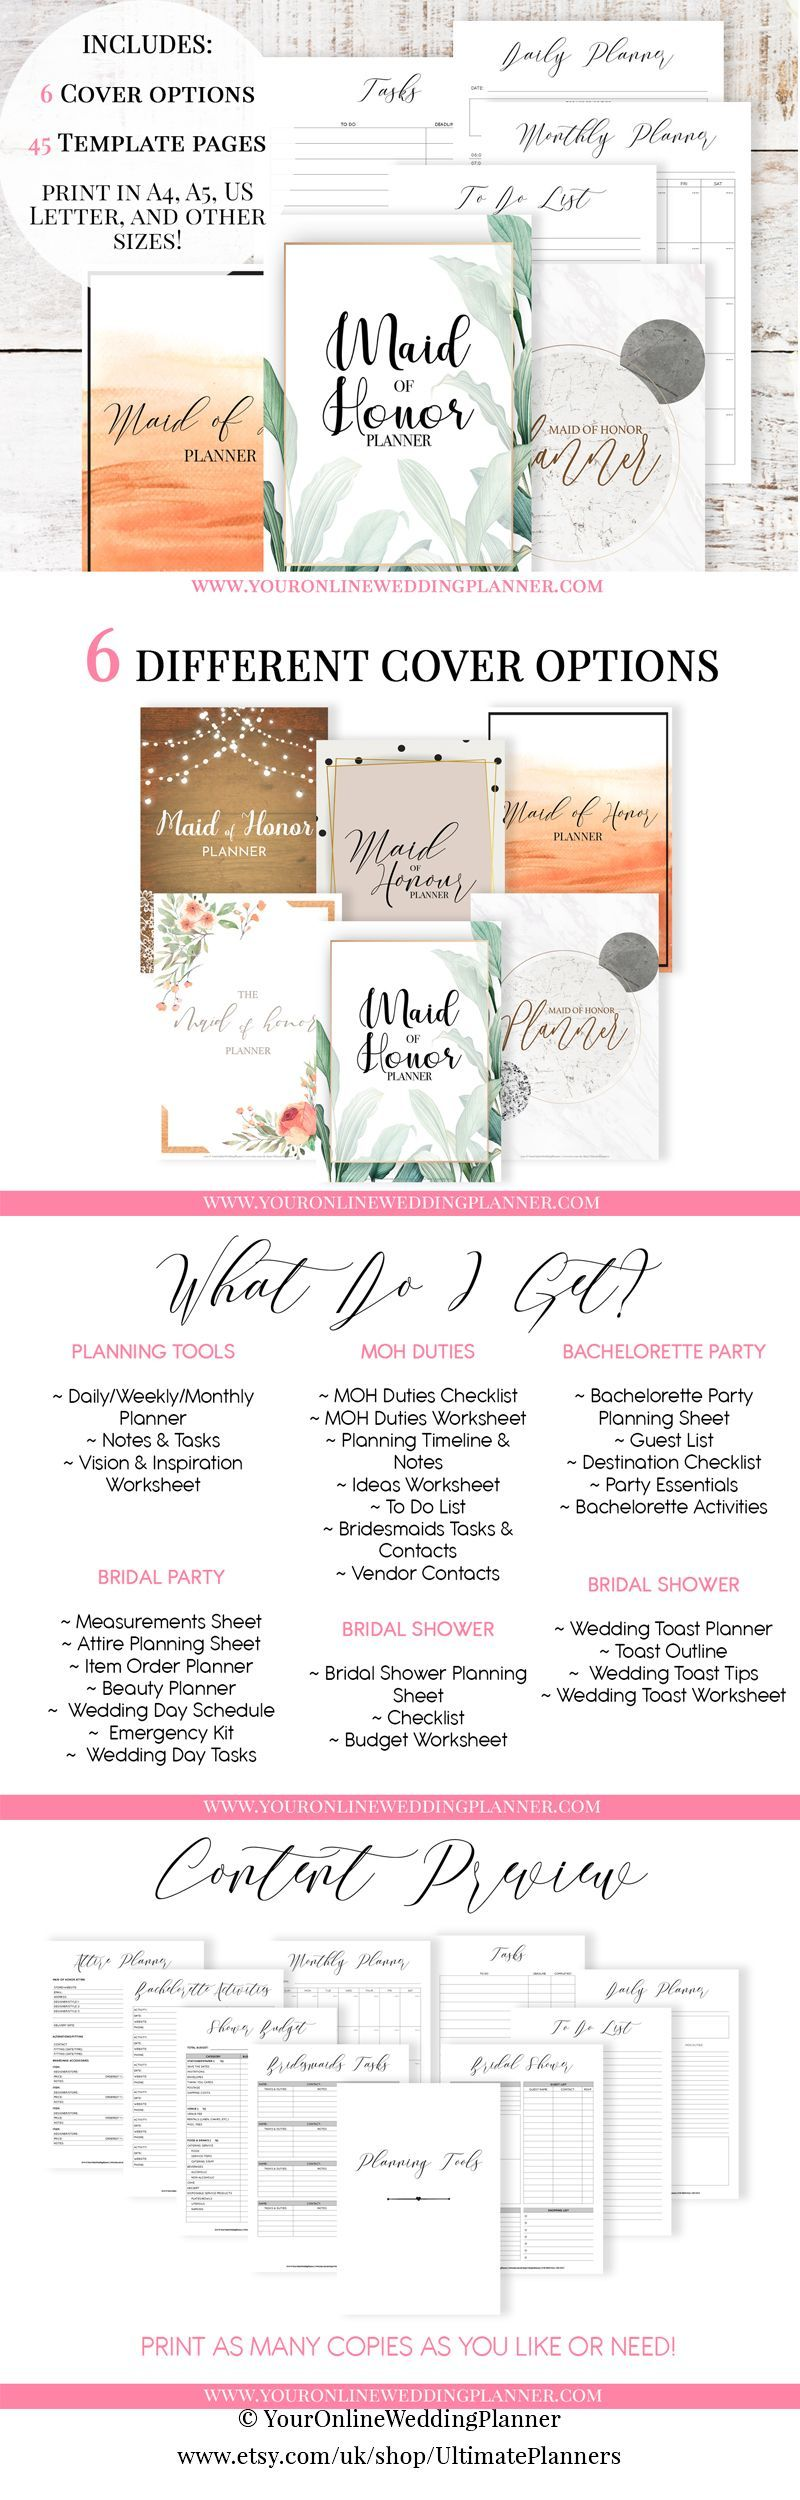 Maid Of Honor Planner Wedding Planner Printable Maid Of Honour Planner Wedding Printables Ma In 2020 Wedding Planner Printables Wedding Planner Book Wedding Planner